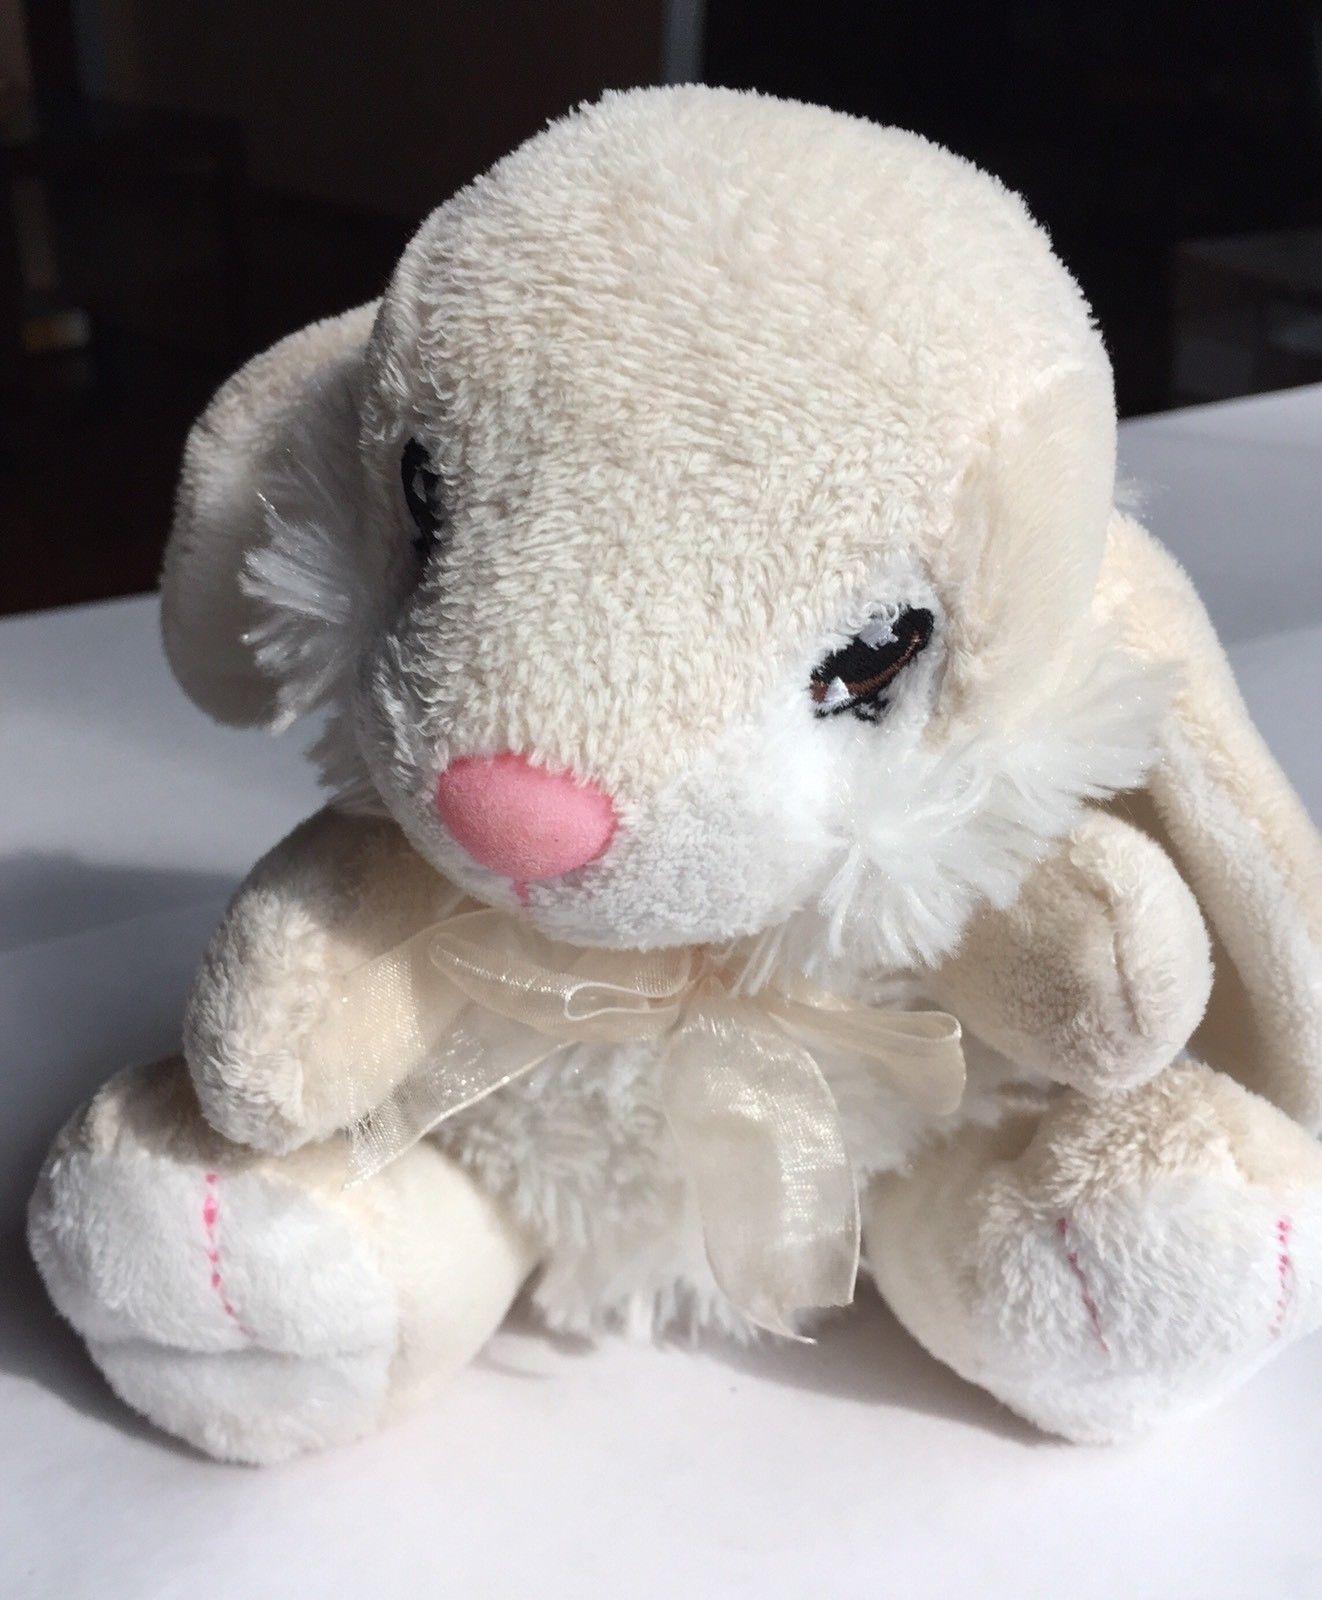 Dan Dee Bunny Rabbit Cream White 2010 Easter Plush Soft